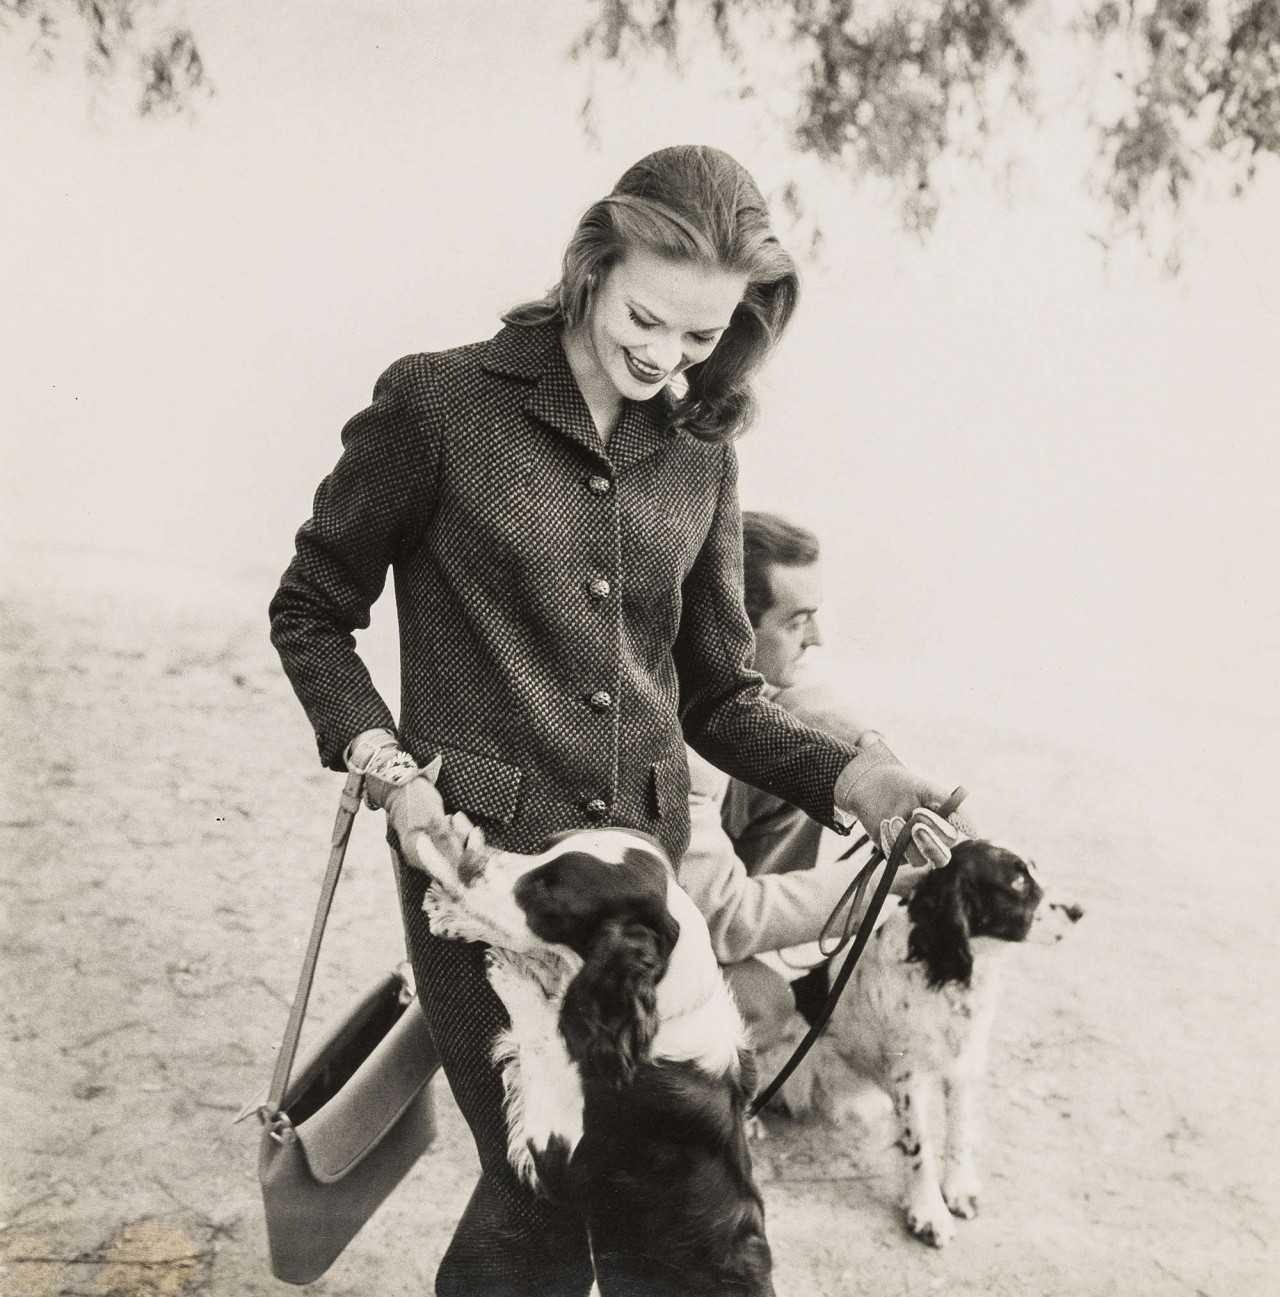 Сьюзен Абрахам со спаниелями. Фотограф Норман Паркинсон